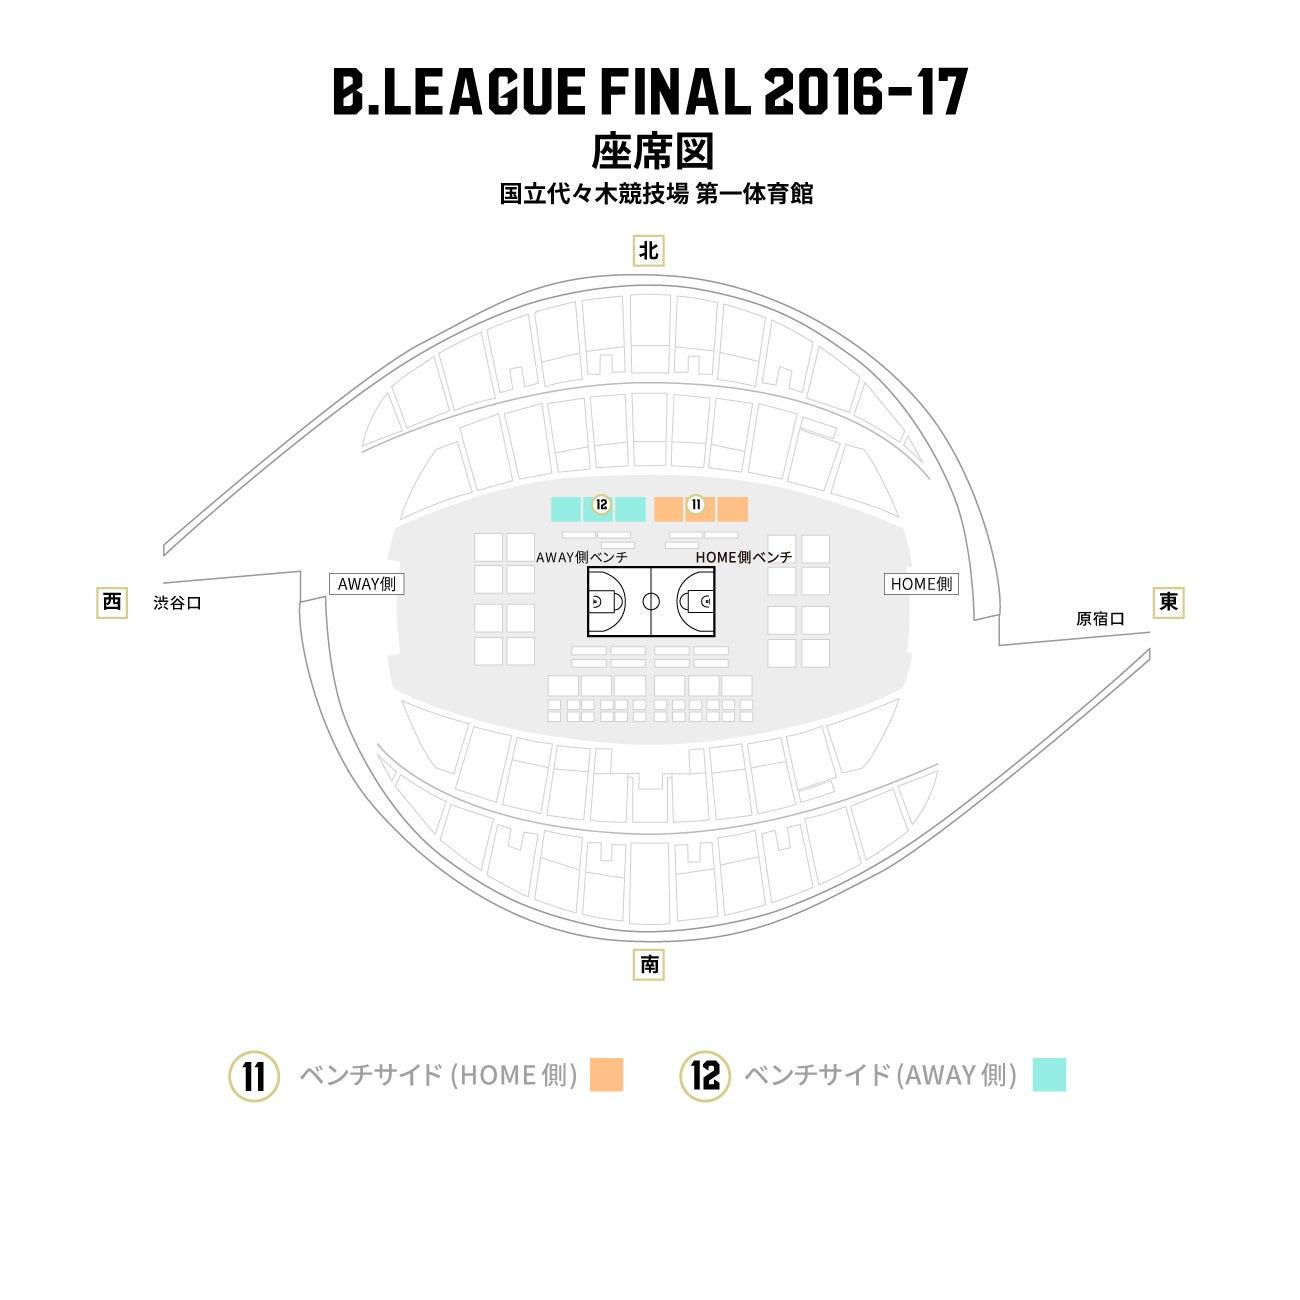 seatview_final_seat_11_12.jpg